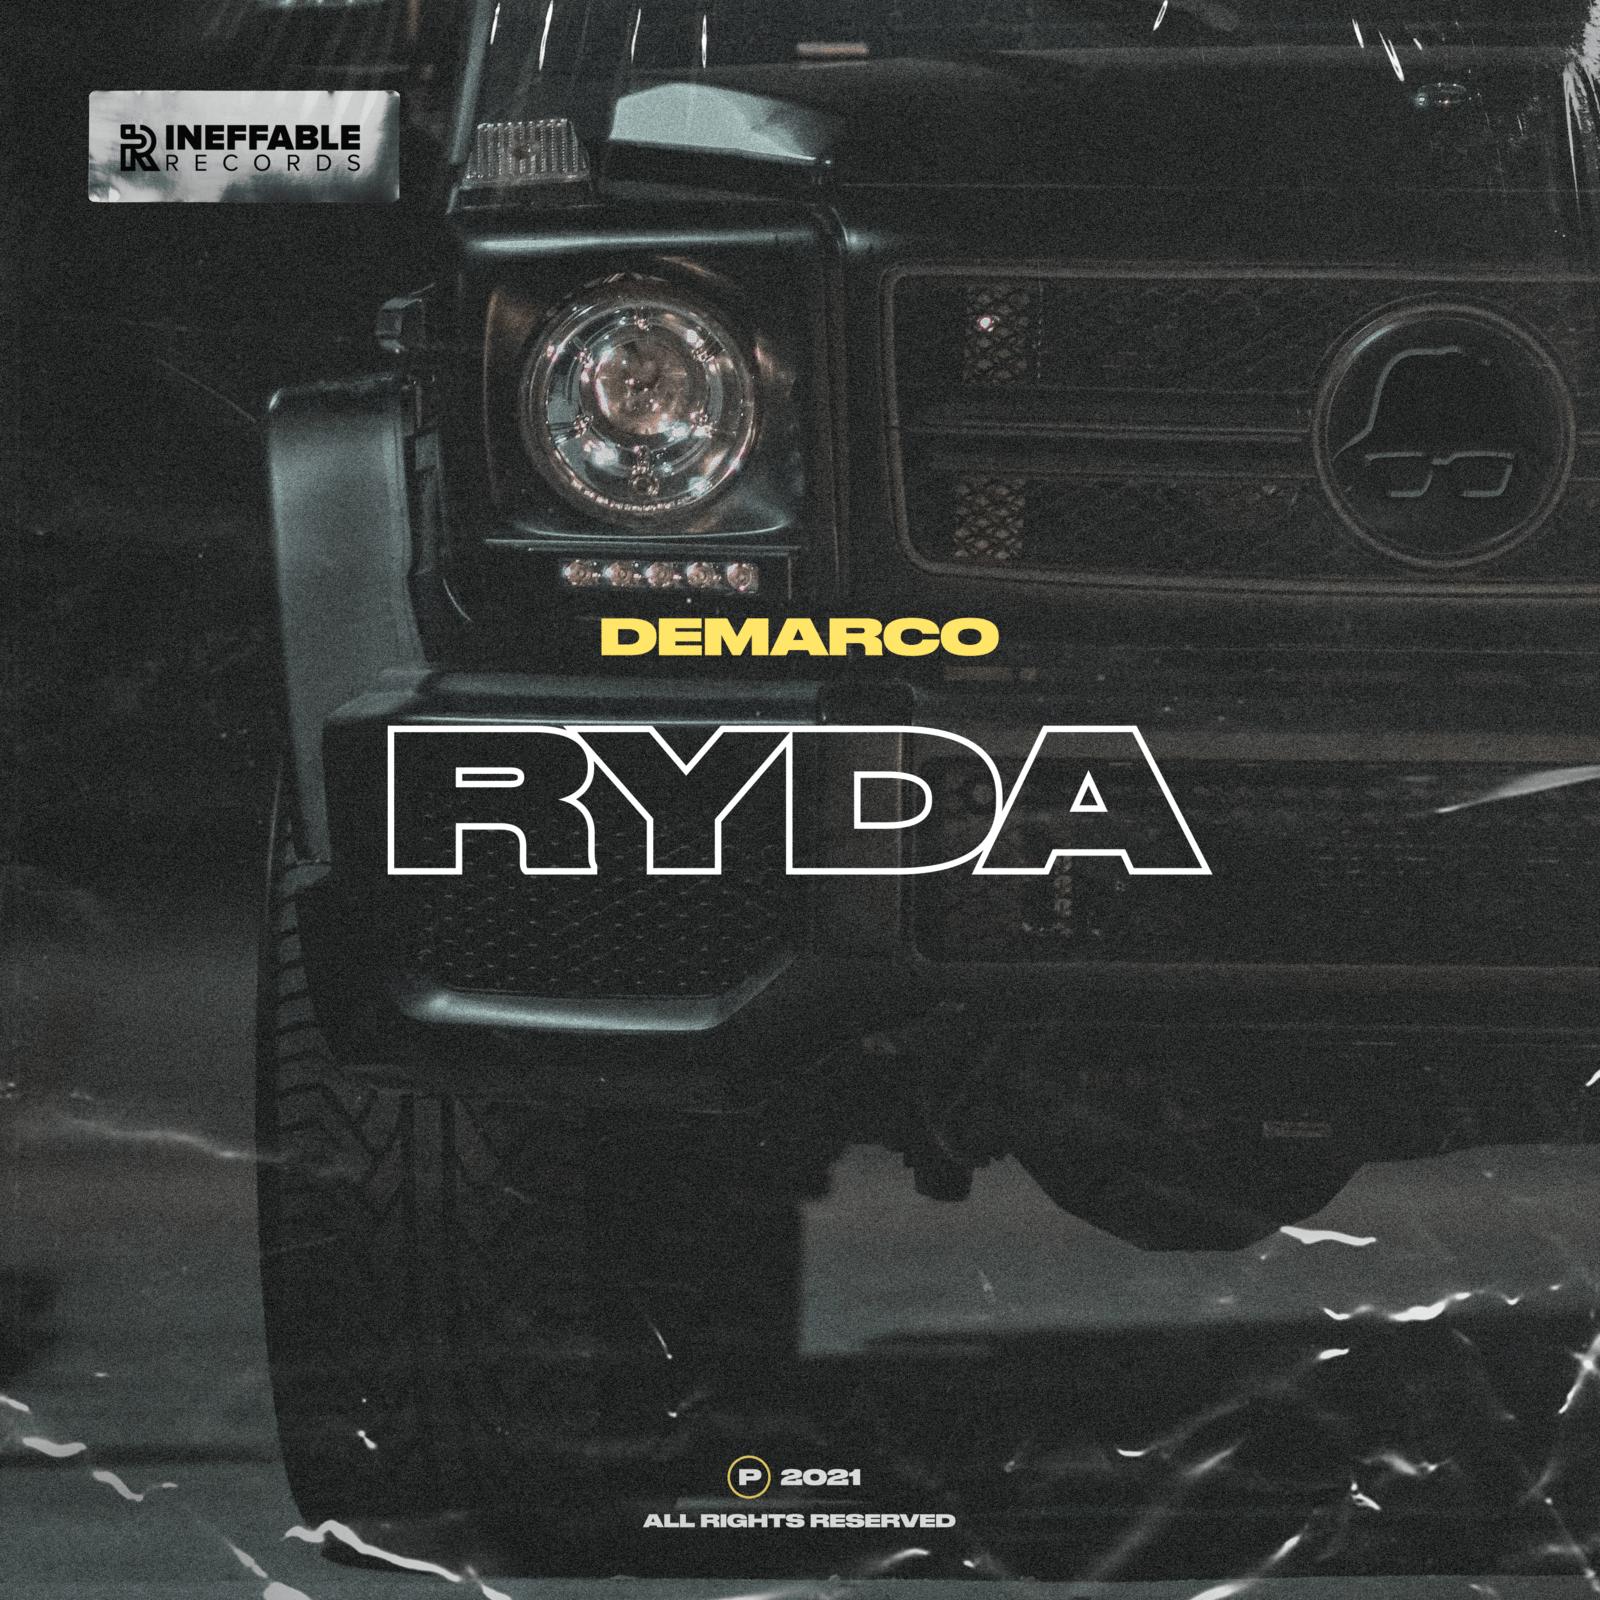 Demarco - Ryda - Ineffable Records